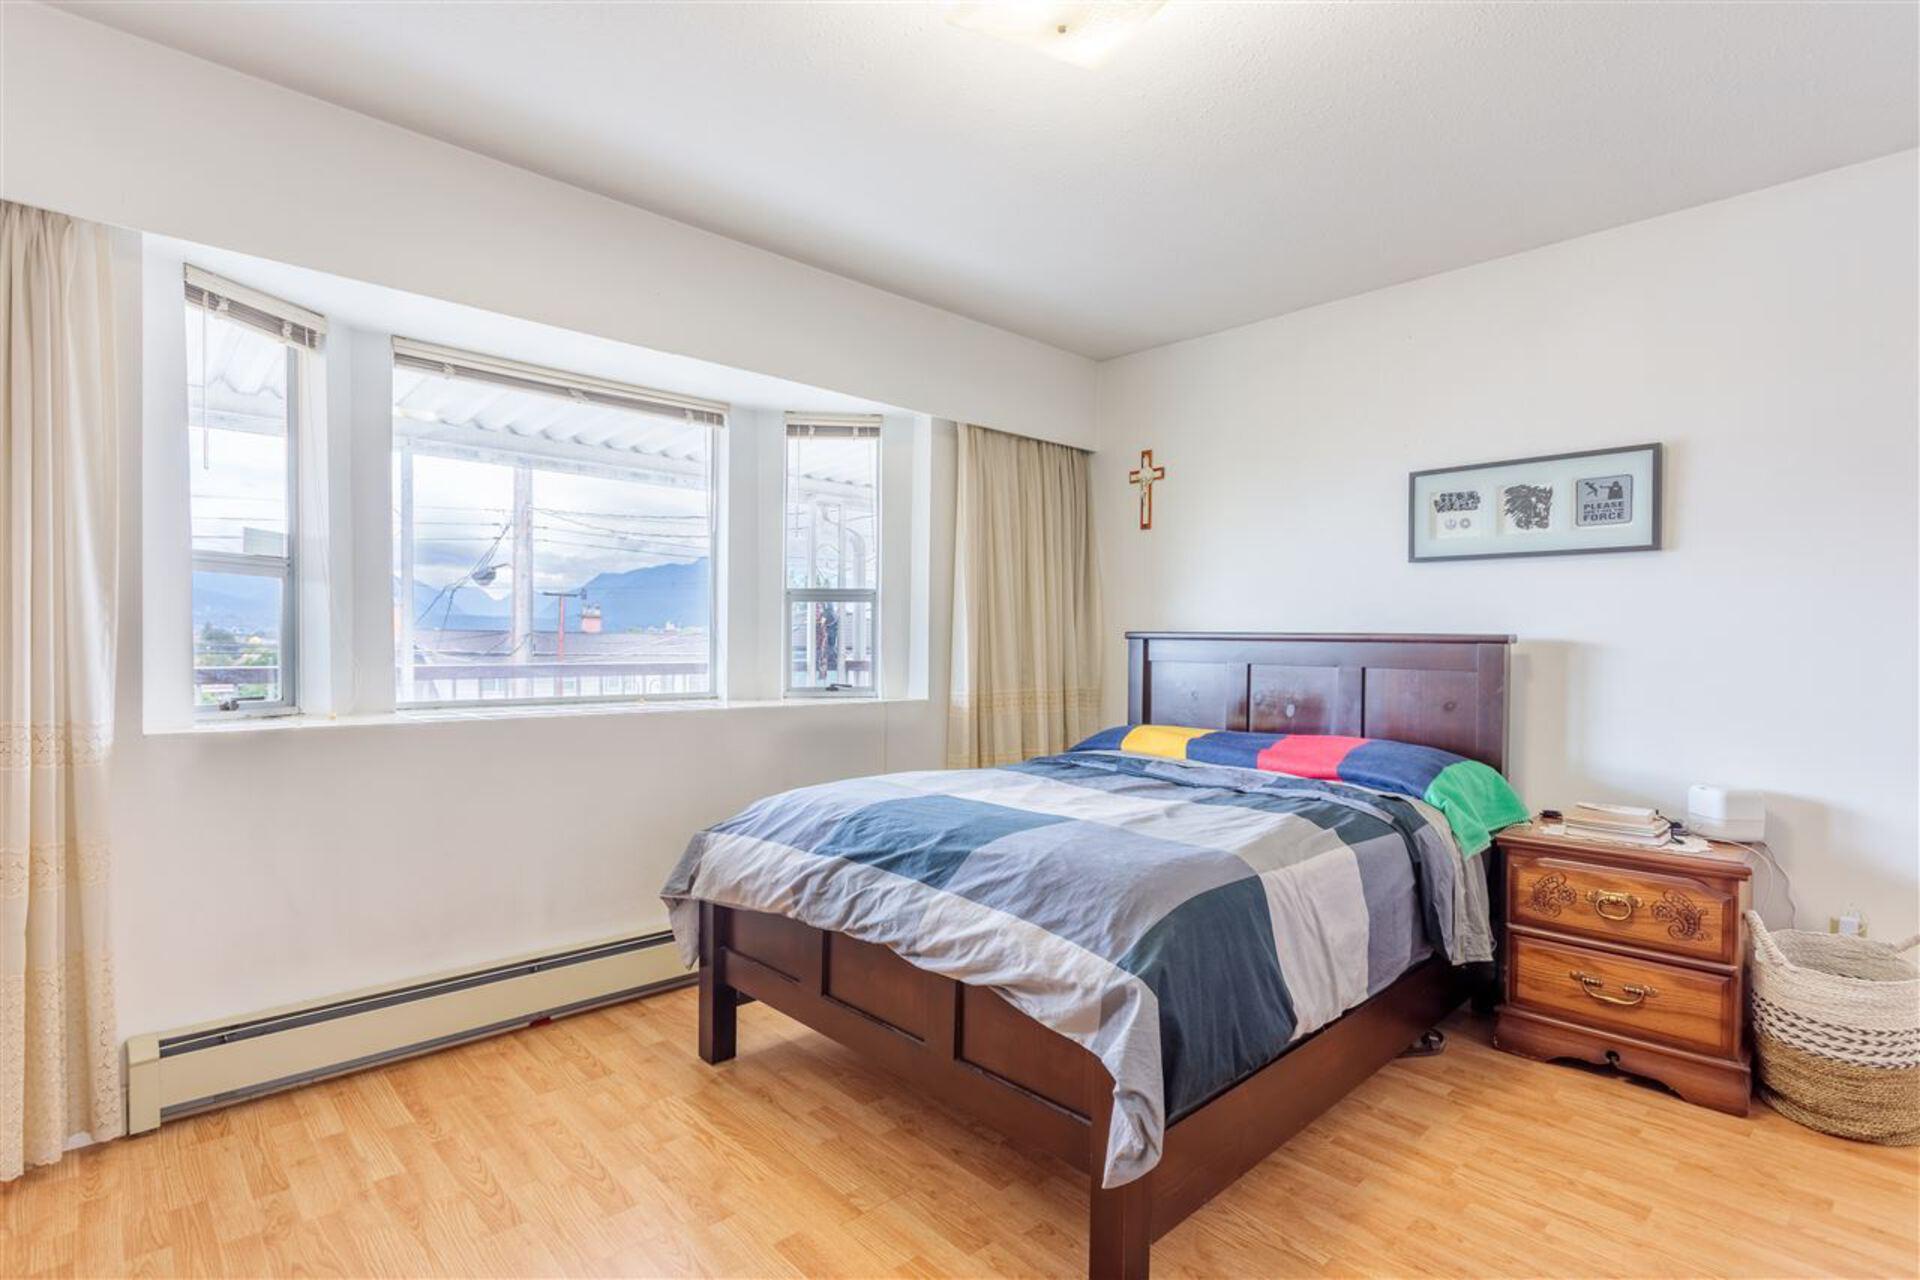 2675-e-5th-avenue-renfrew-ve-vancouver-east-19 at 2675 E 5th Avenue, Renfrew VE, Vancouver East